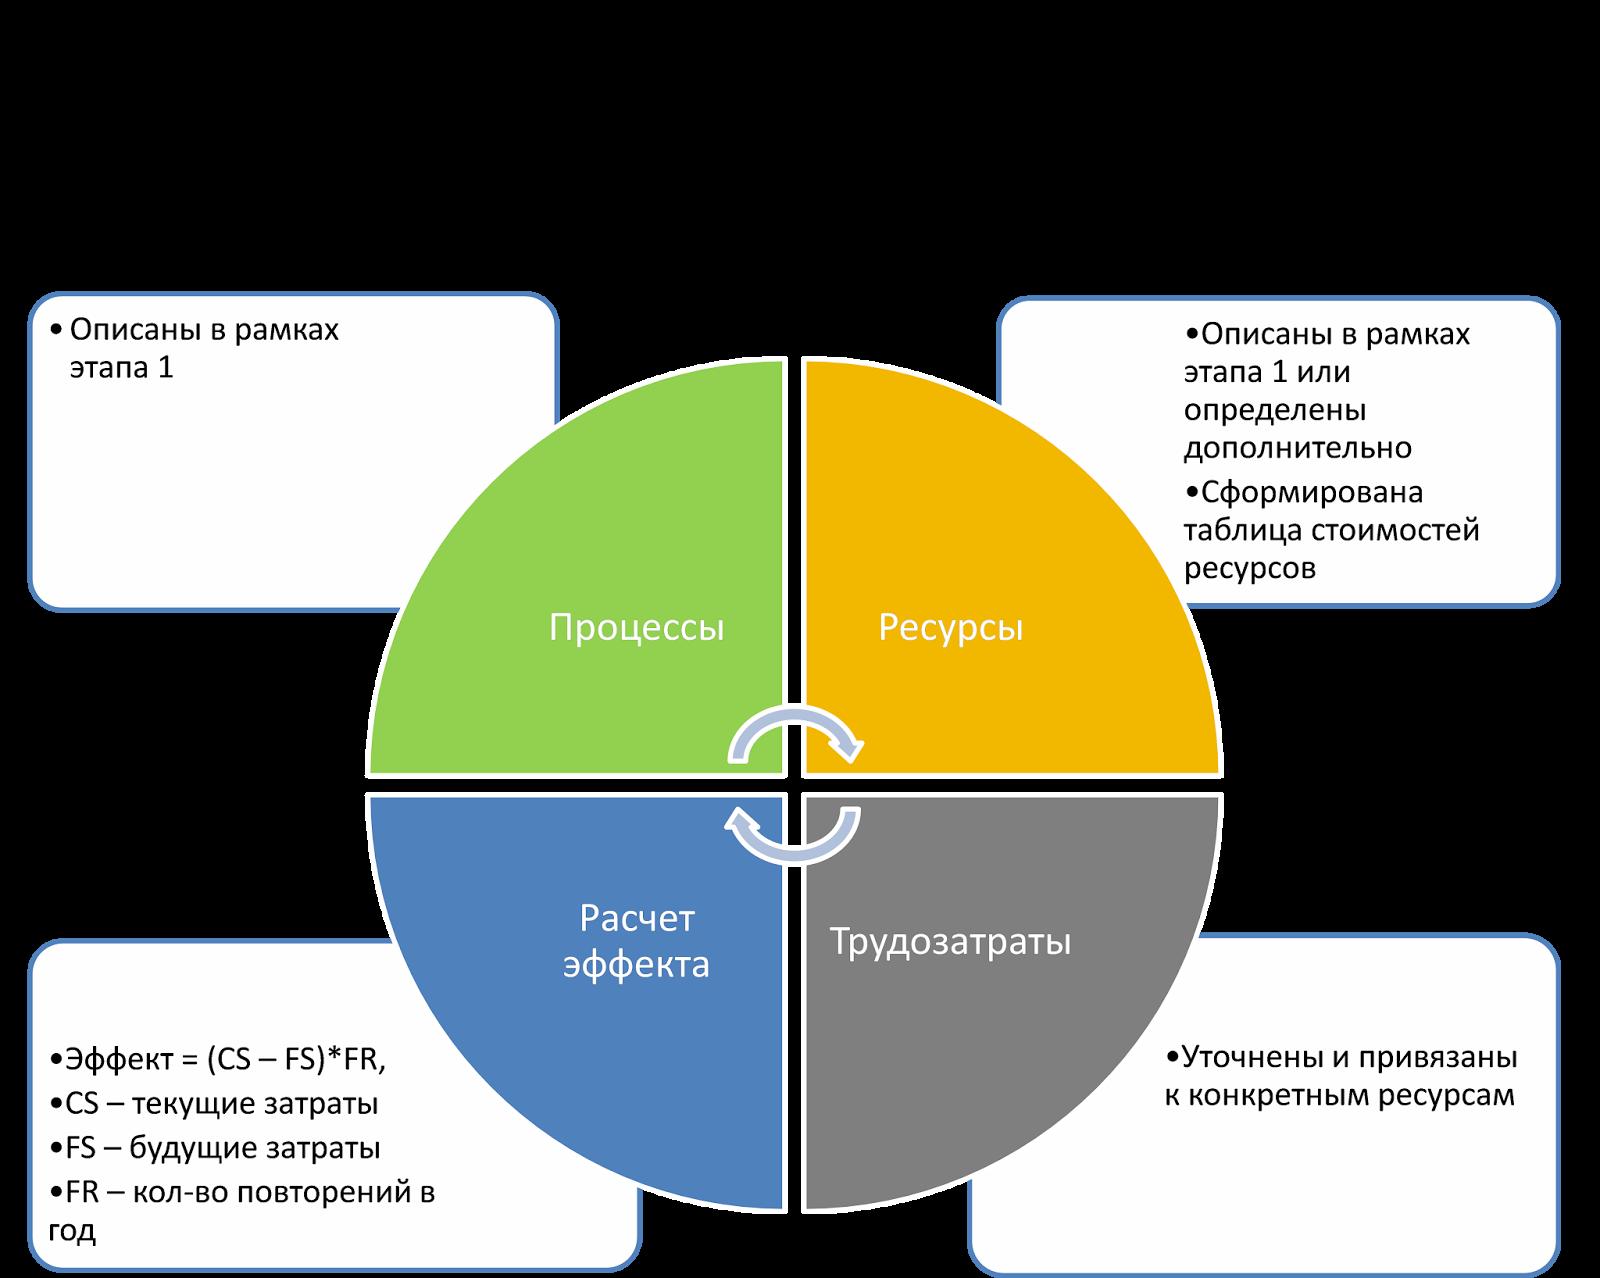 Методика расчета стоимости процесса